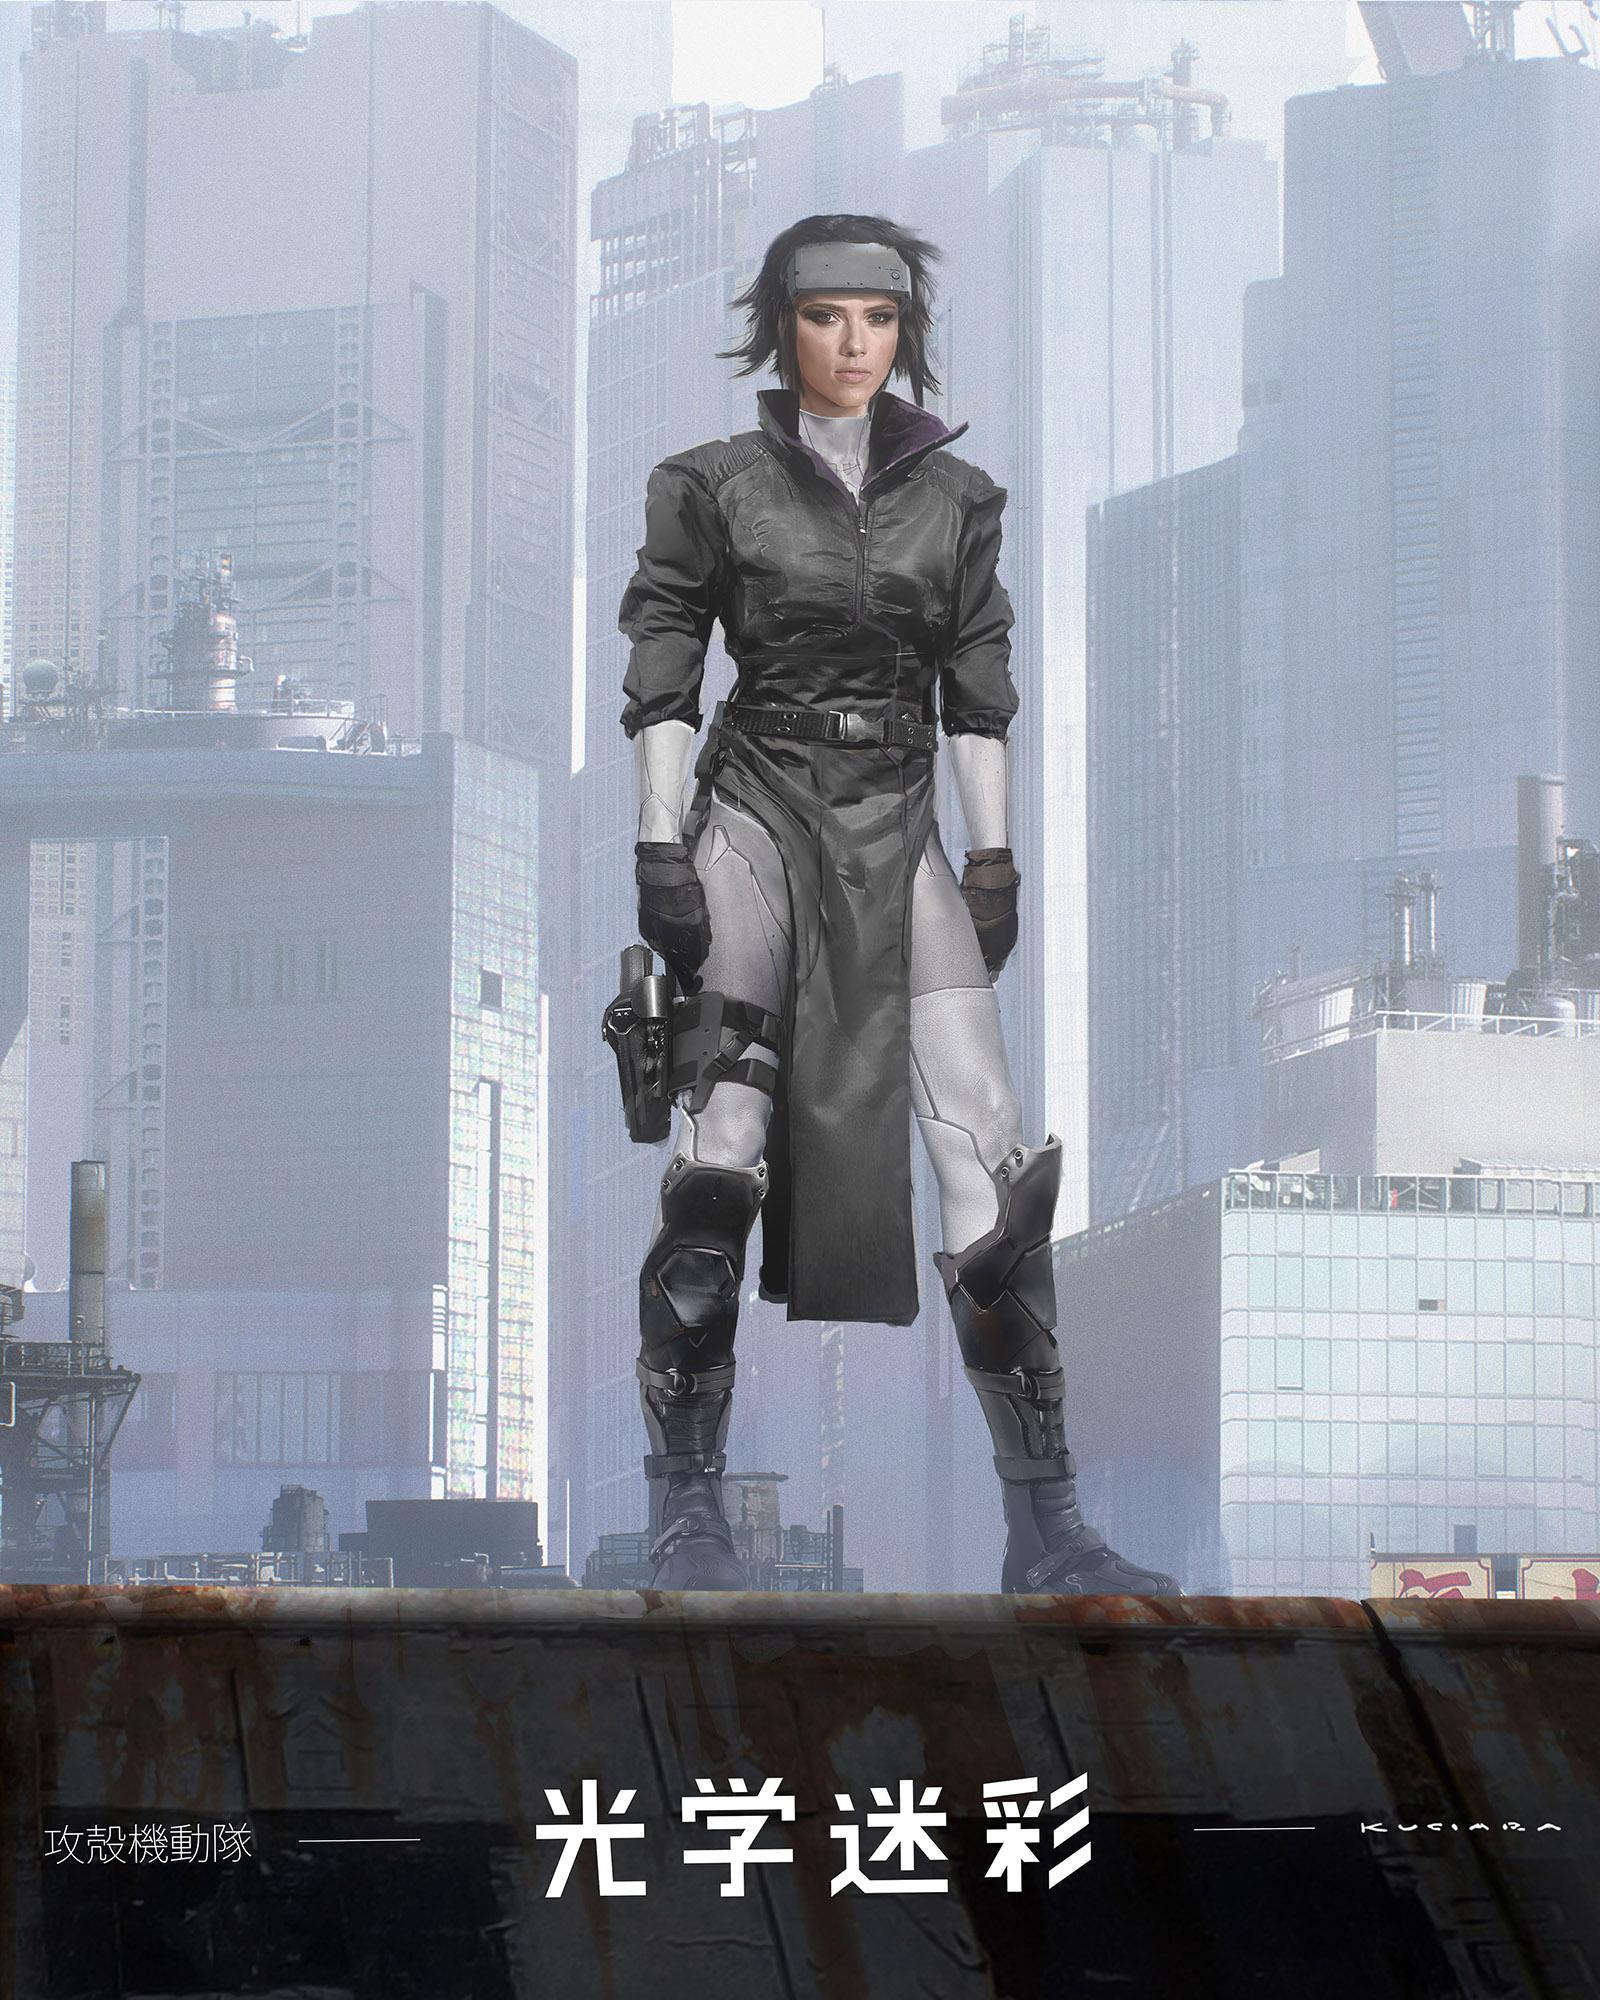 GITS_MajorThermoOptical+Tactical_MK_071315_v04.jpg